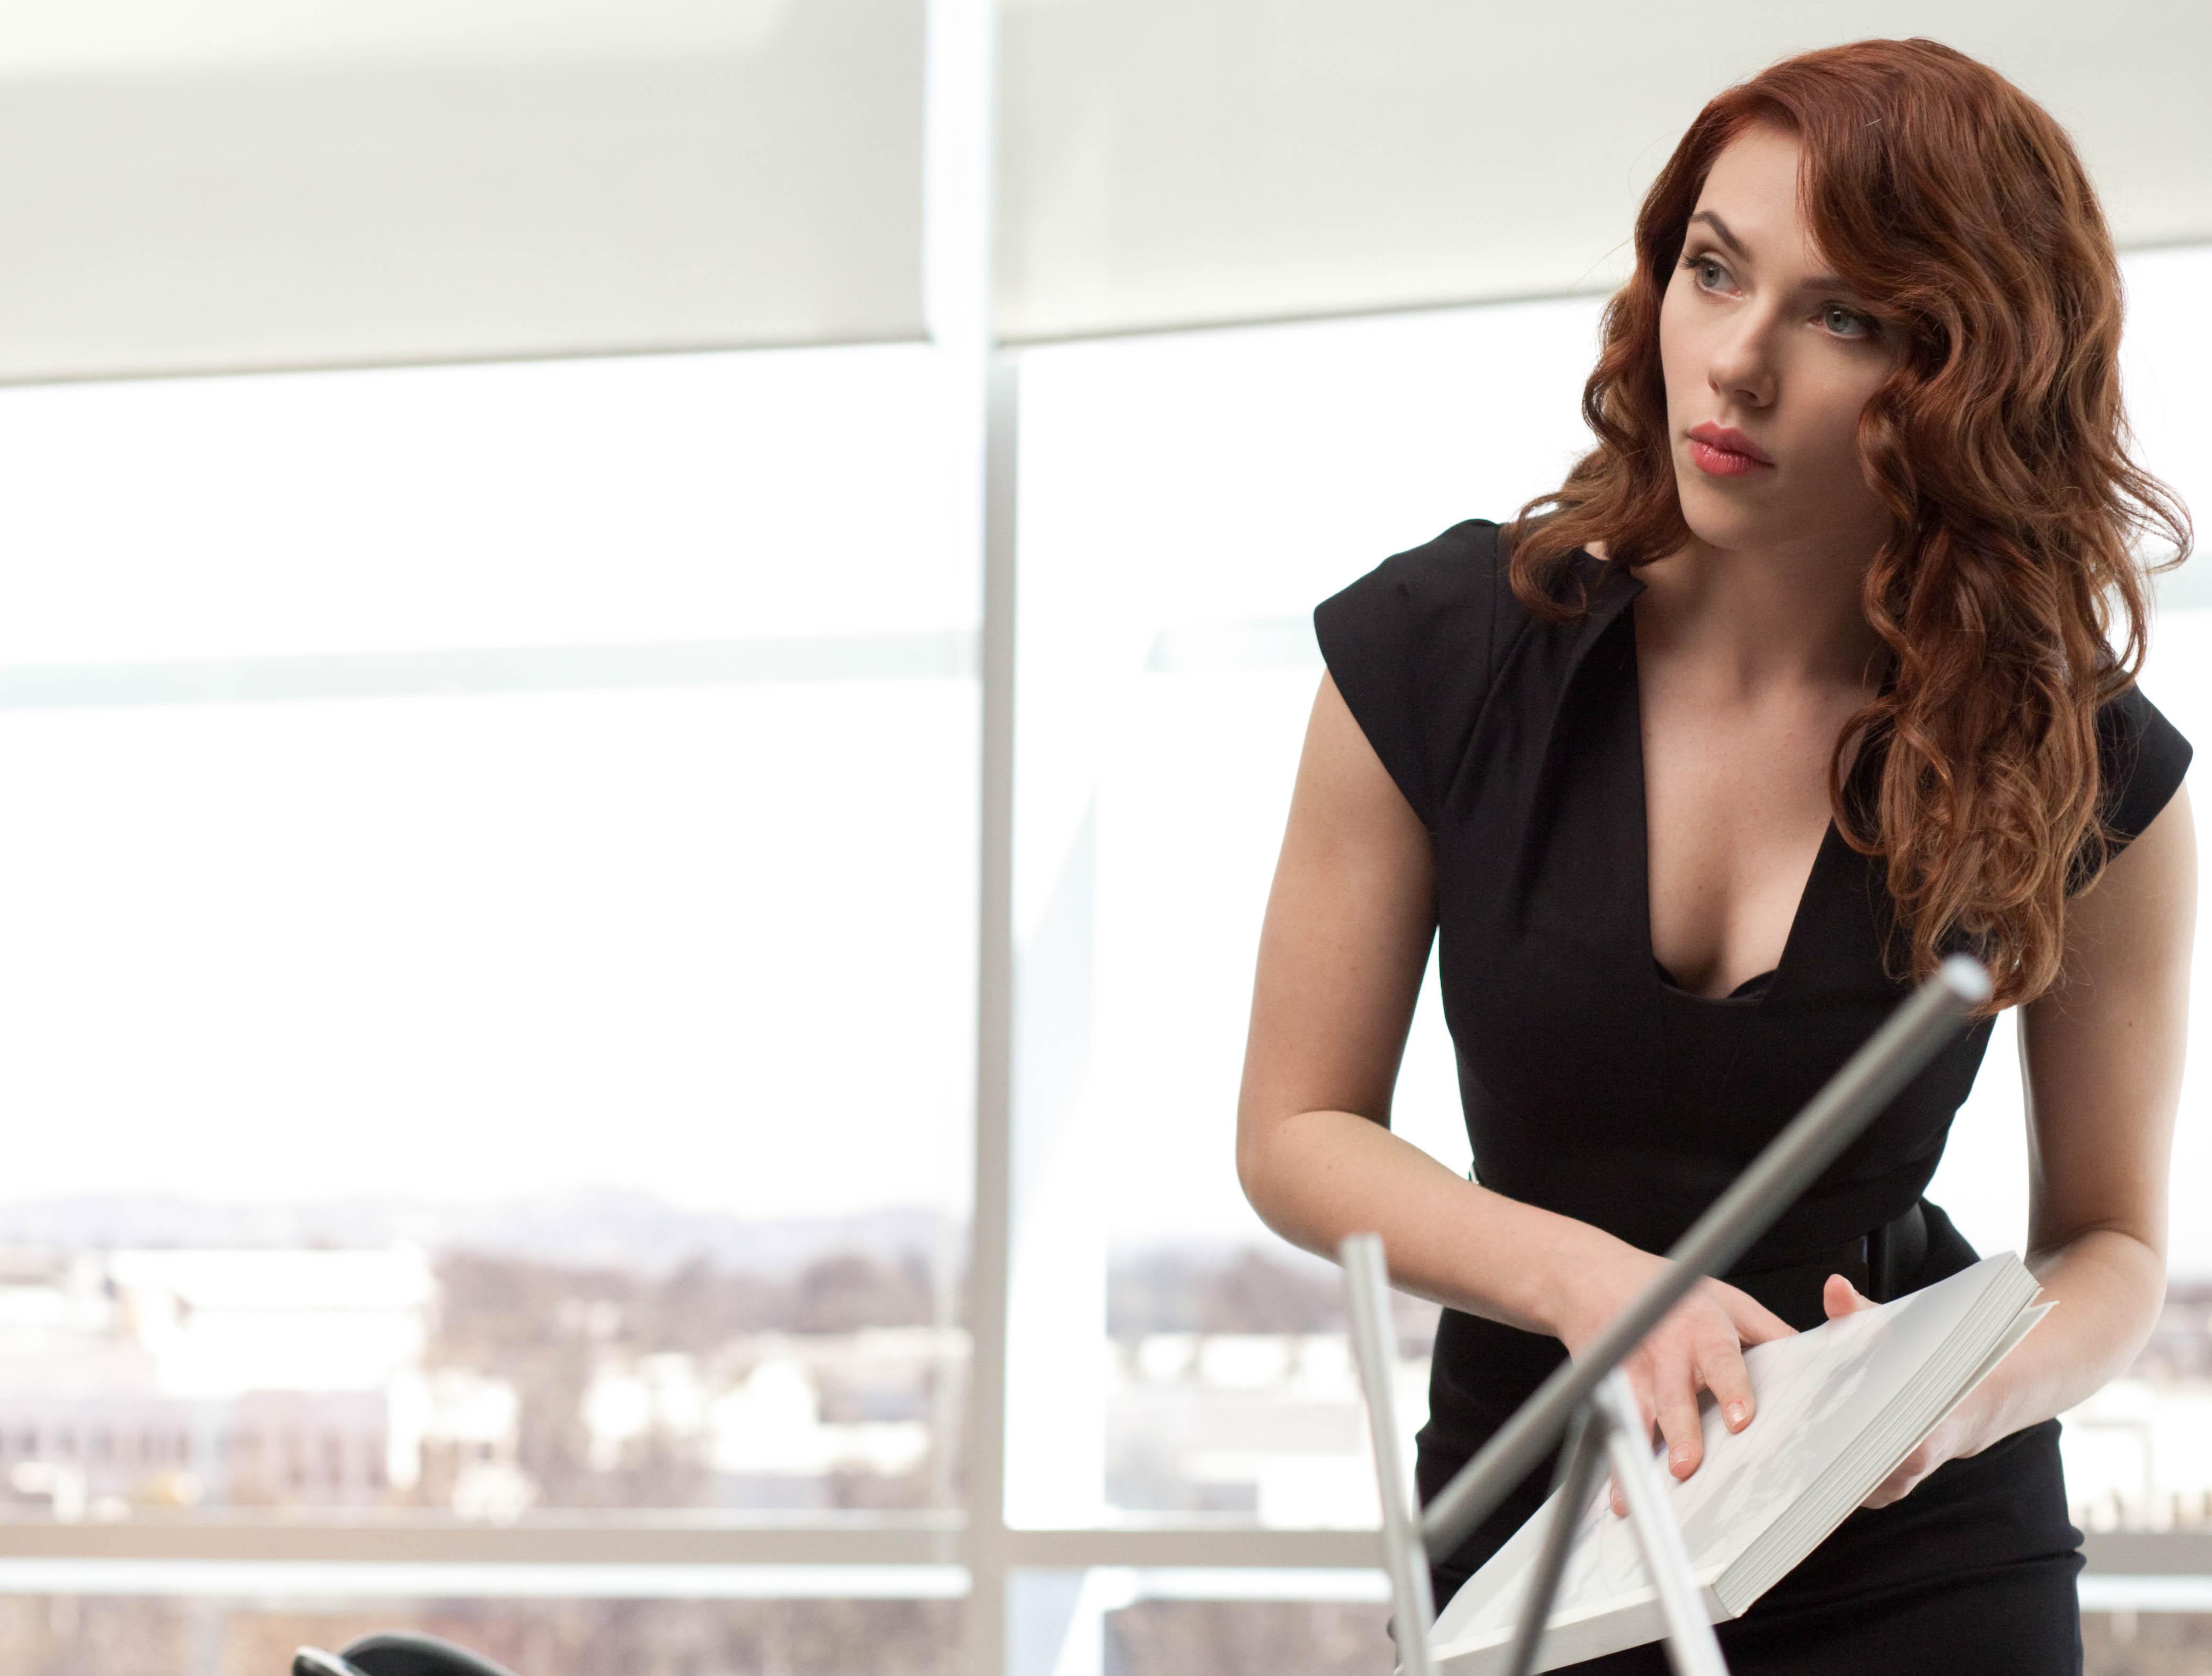 Scarlett Johansson Wallpapers 2019 4173x3161